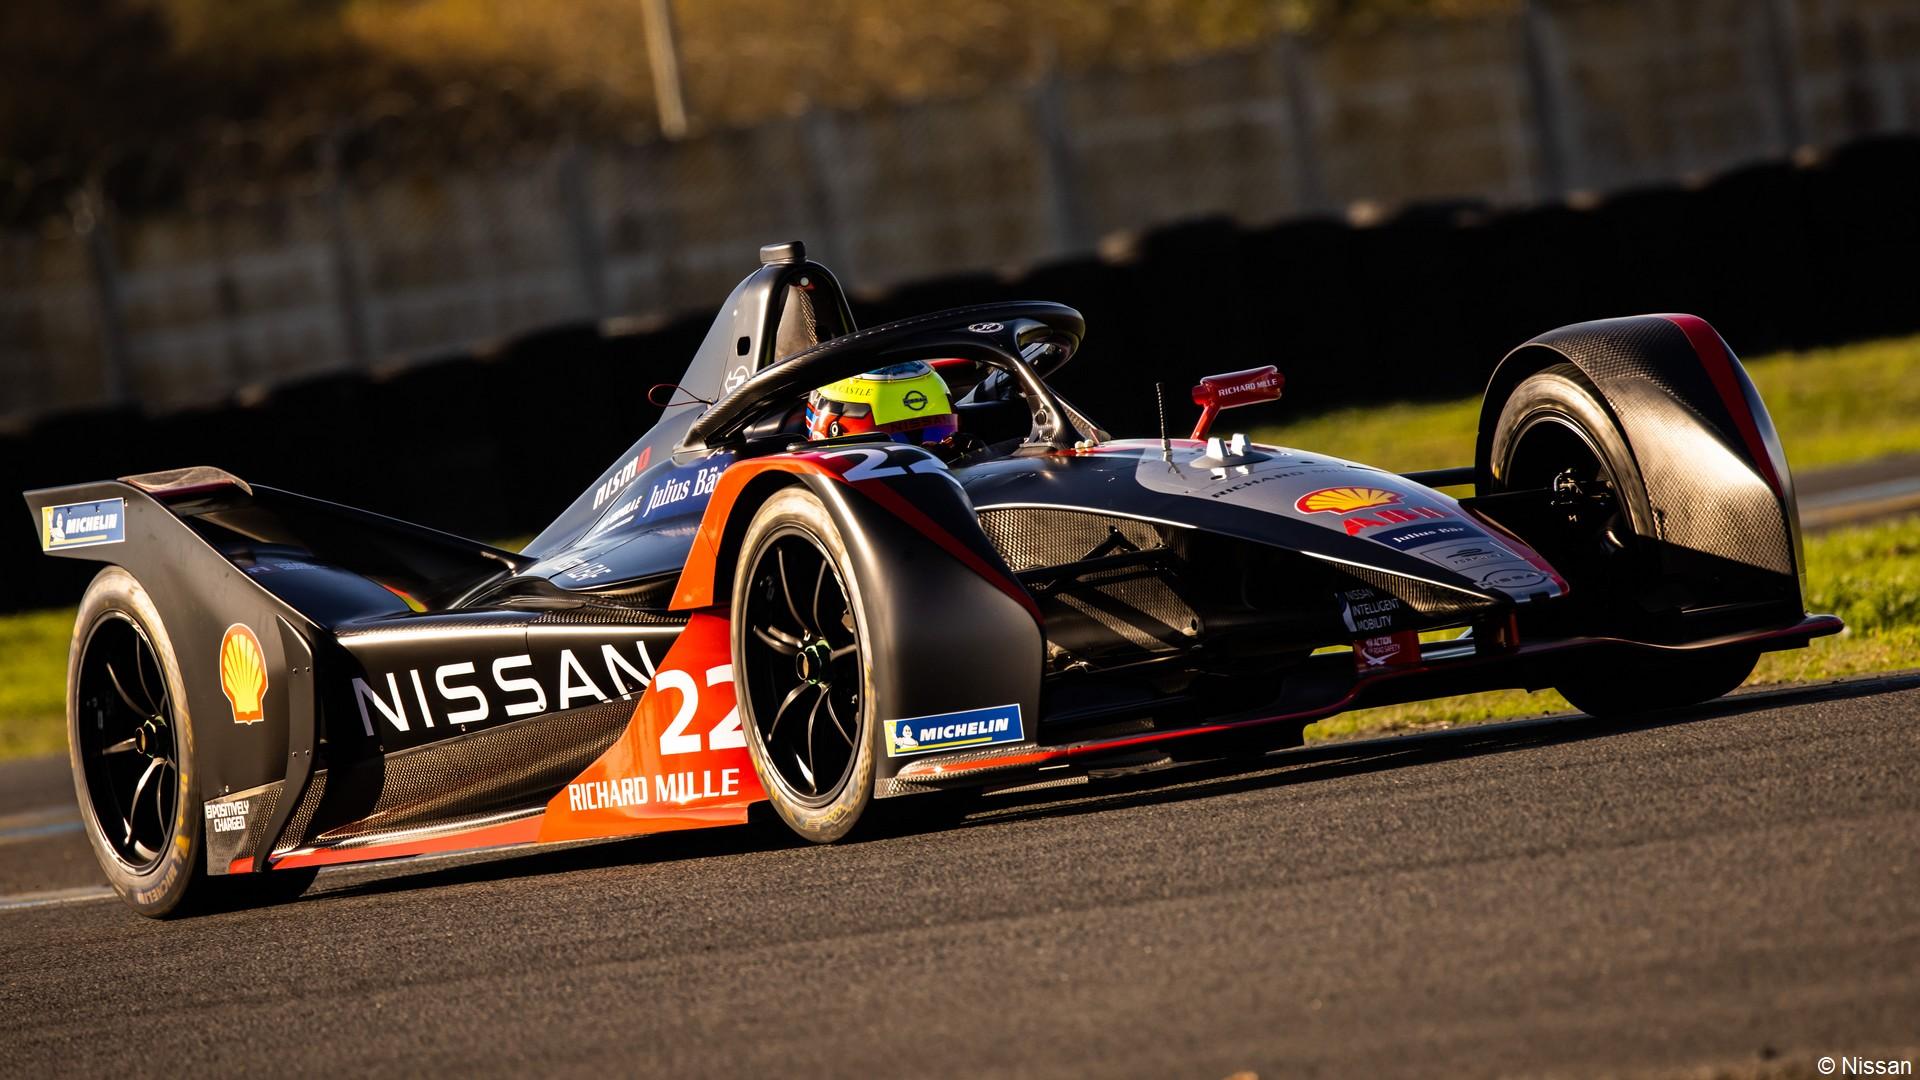 Formula e – Nissan 2021